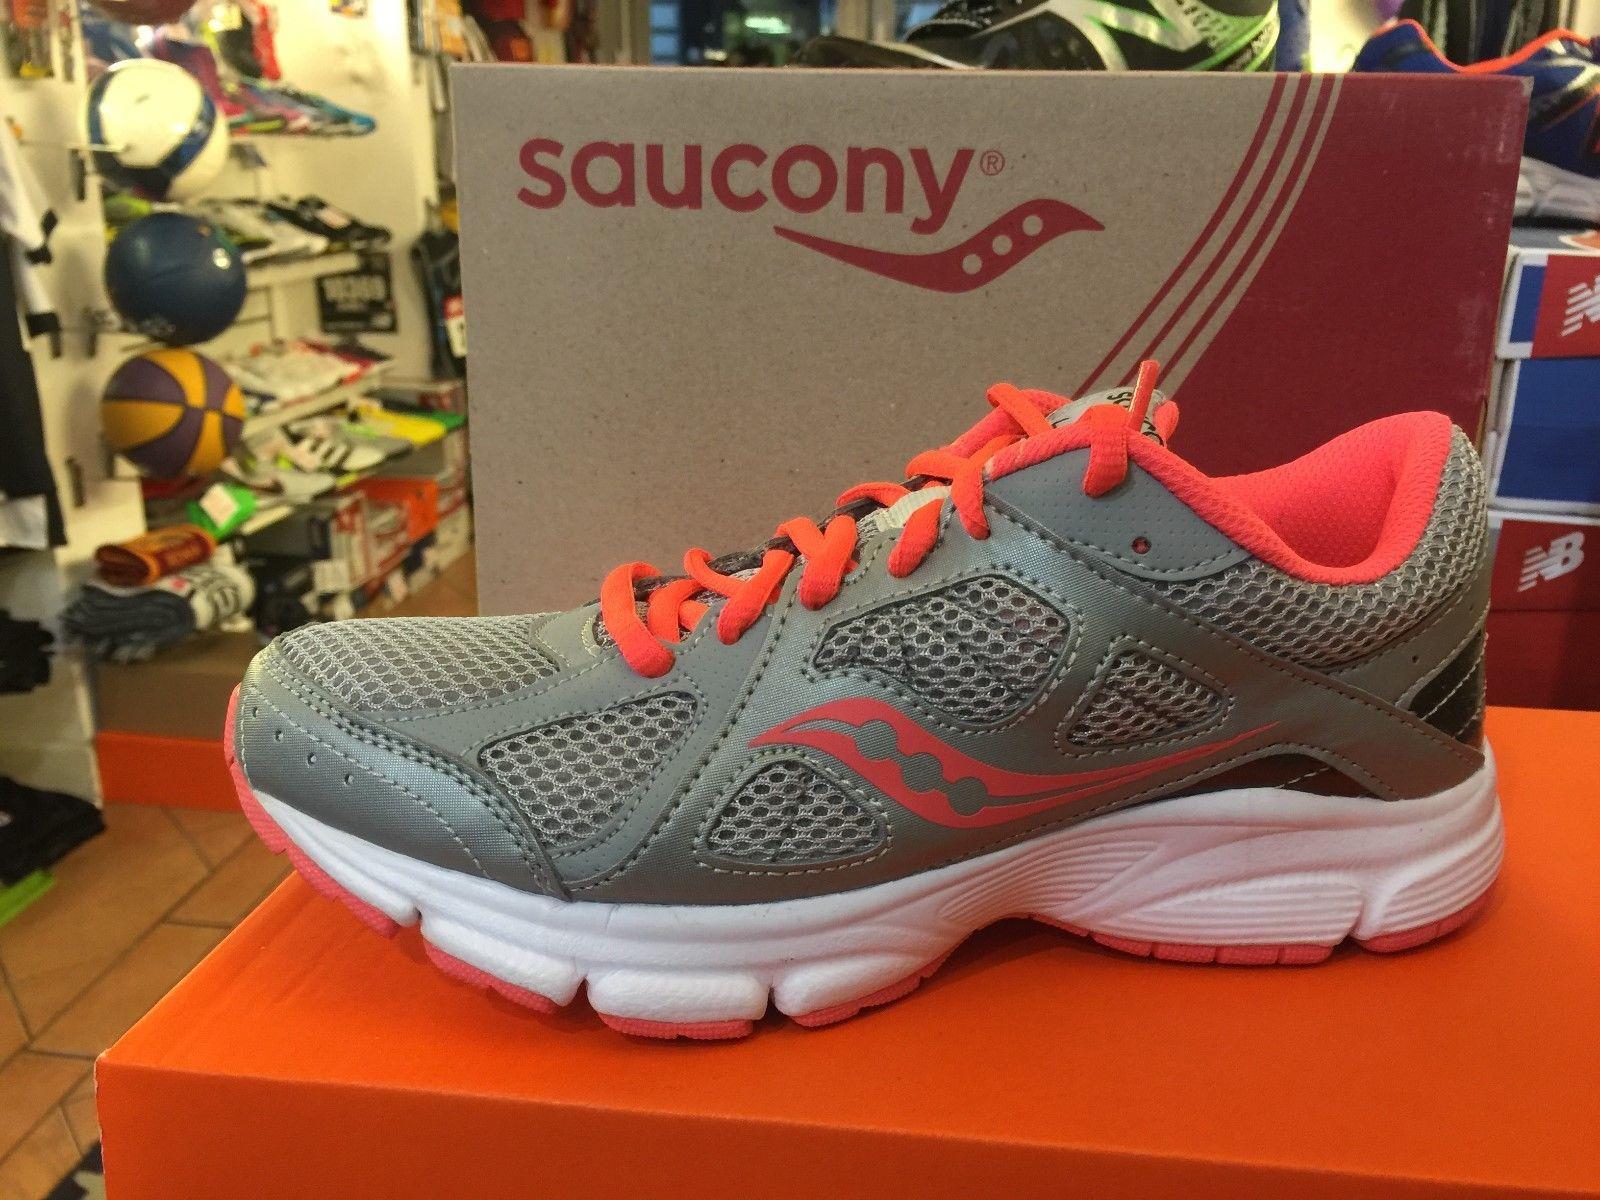 designer fashion 81be2 b7069 Saucony Scarpa Running TG 35/ SPORT RUNNING NUOVA DA NEGOZIO SAUCONY  PALESTRA